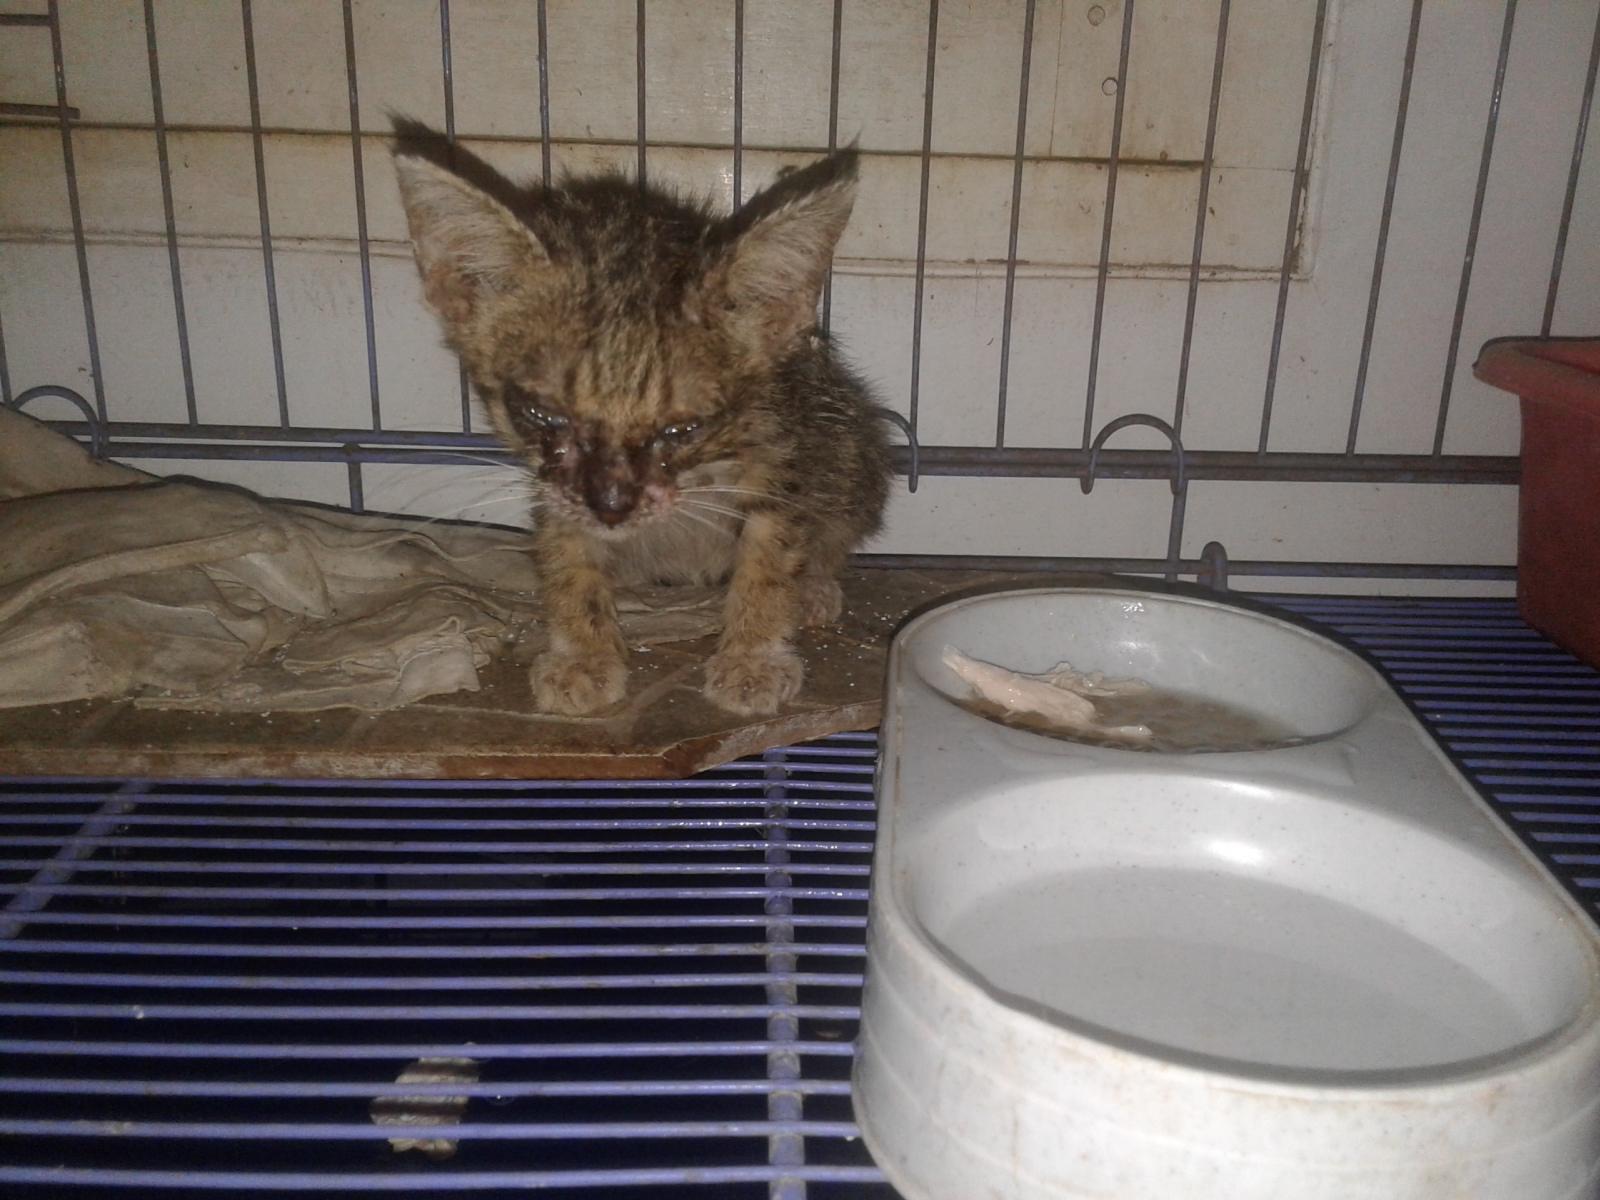 Pengalaman Merawat Kucing Liar Kampung TheProject